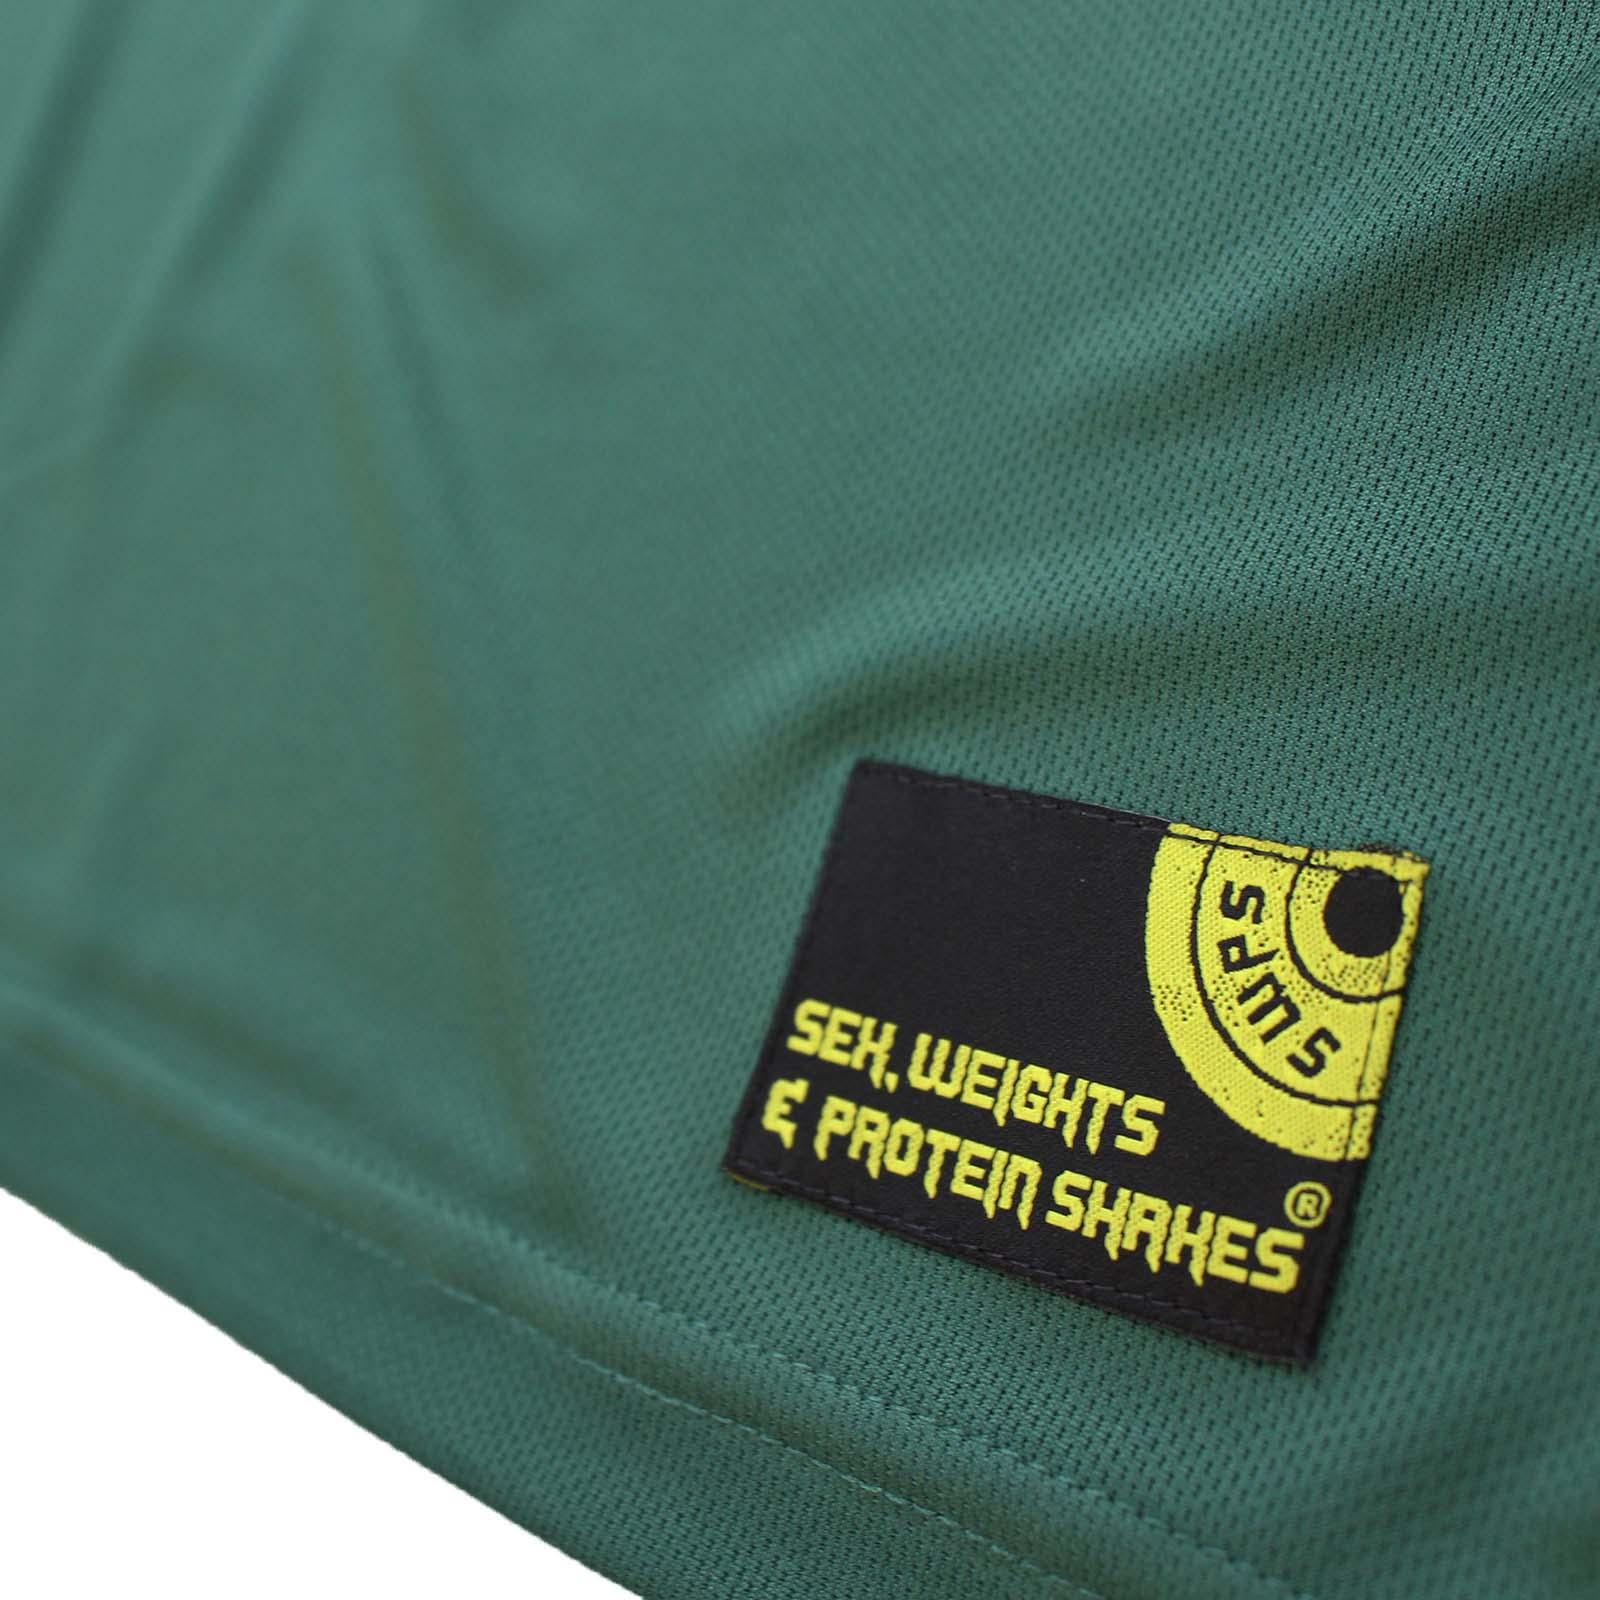 Swps NO PAIN NO GAIN Cheeseburger Dry Fit Sport T-shirt